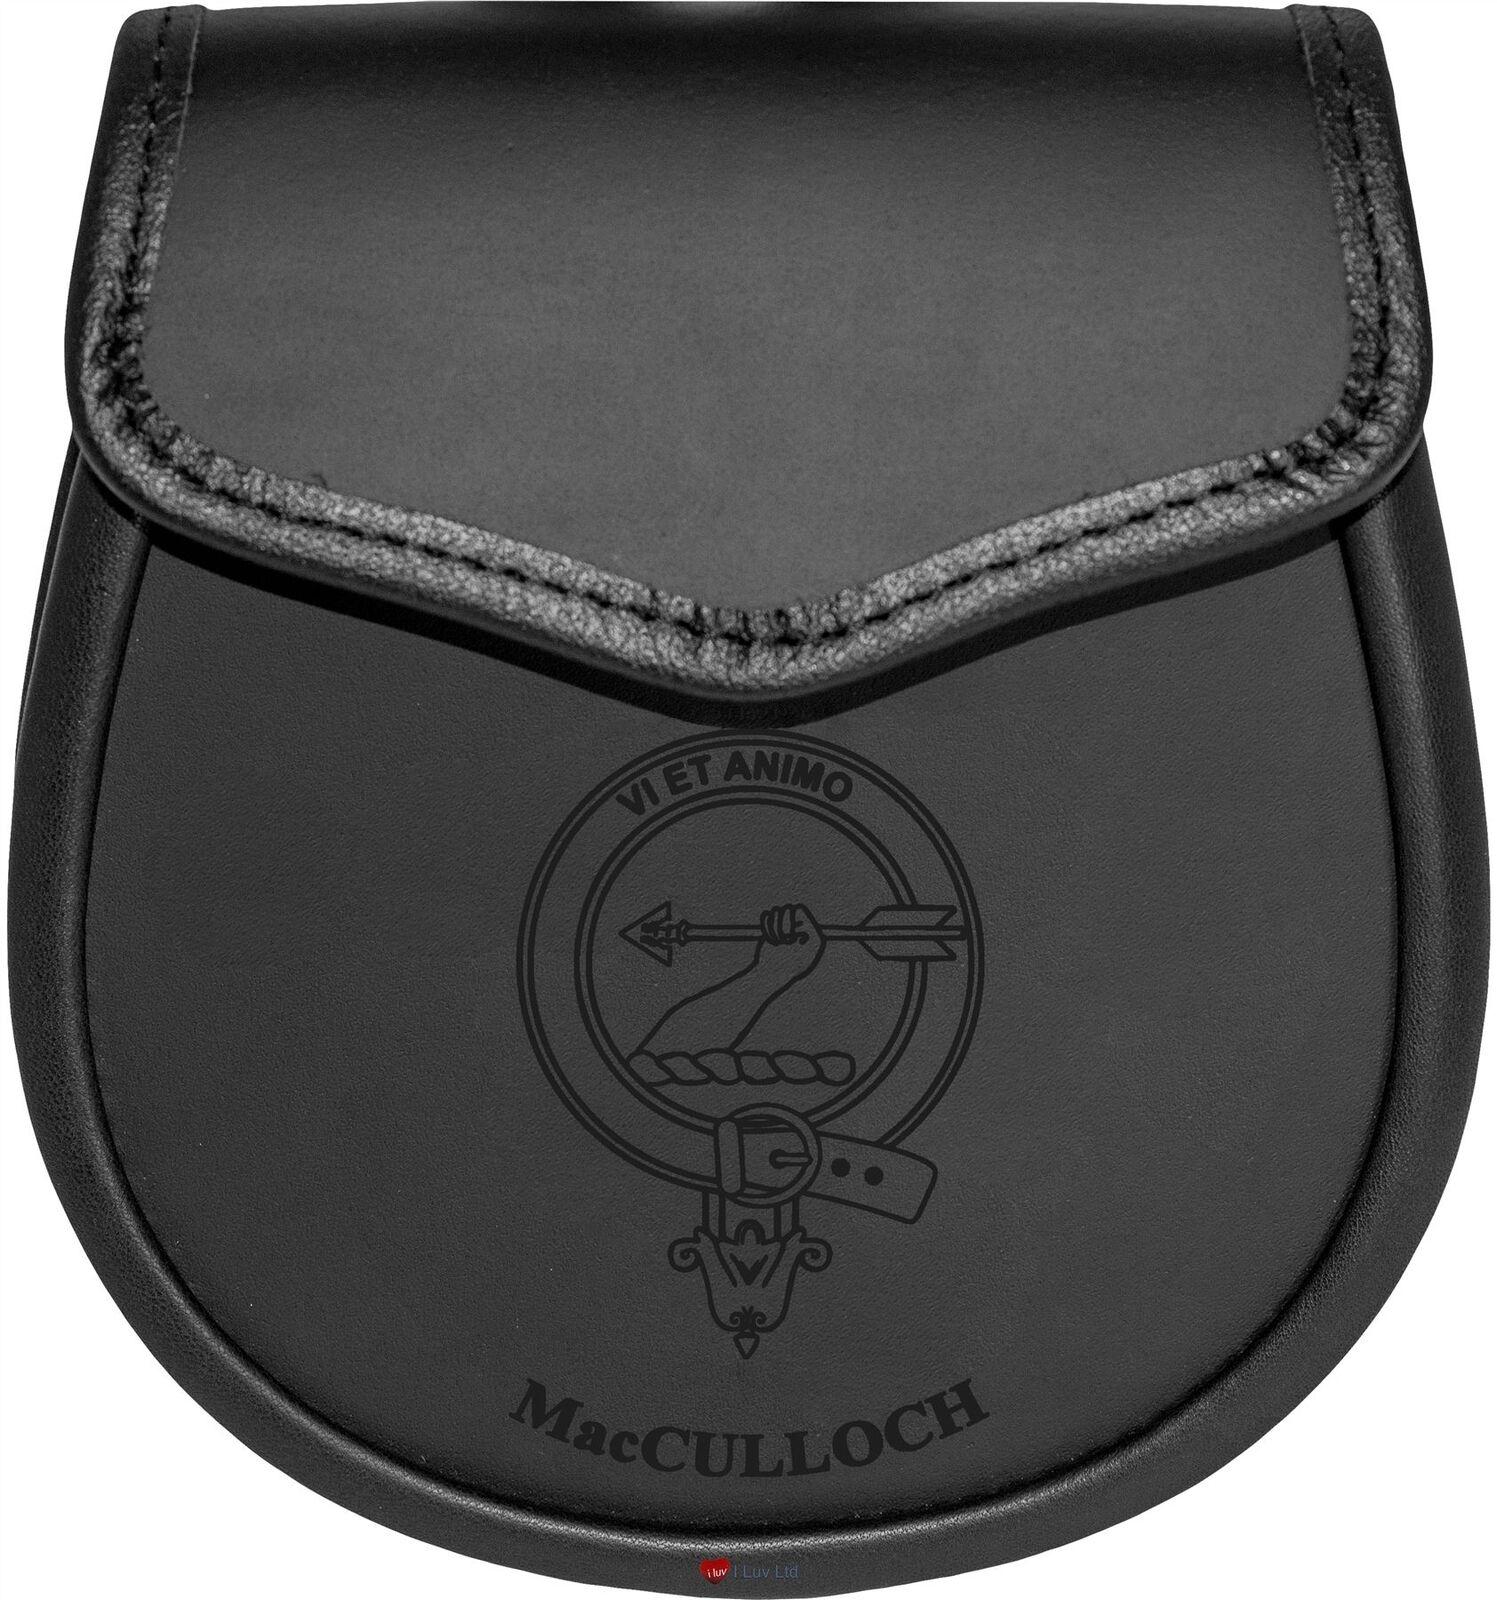 MacCulloch Leather Day Sporran Scottish Clan Crest